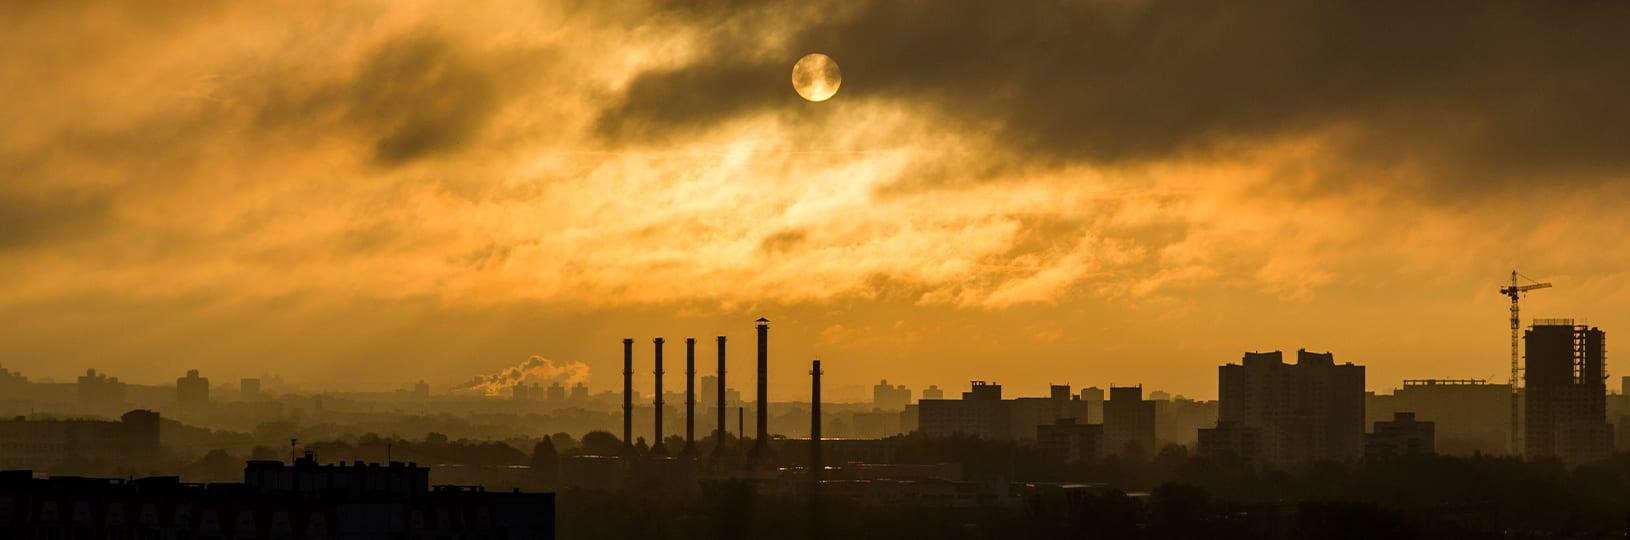 Smog coating a city skyline